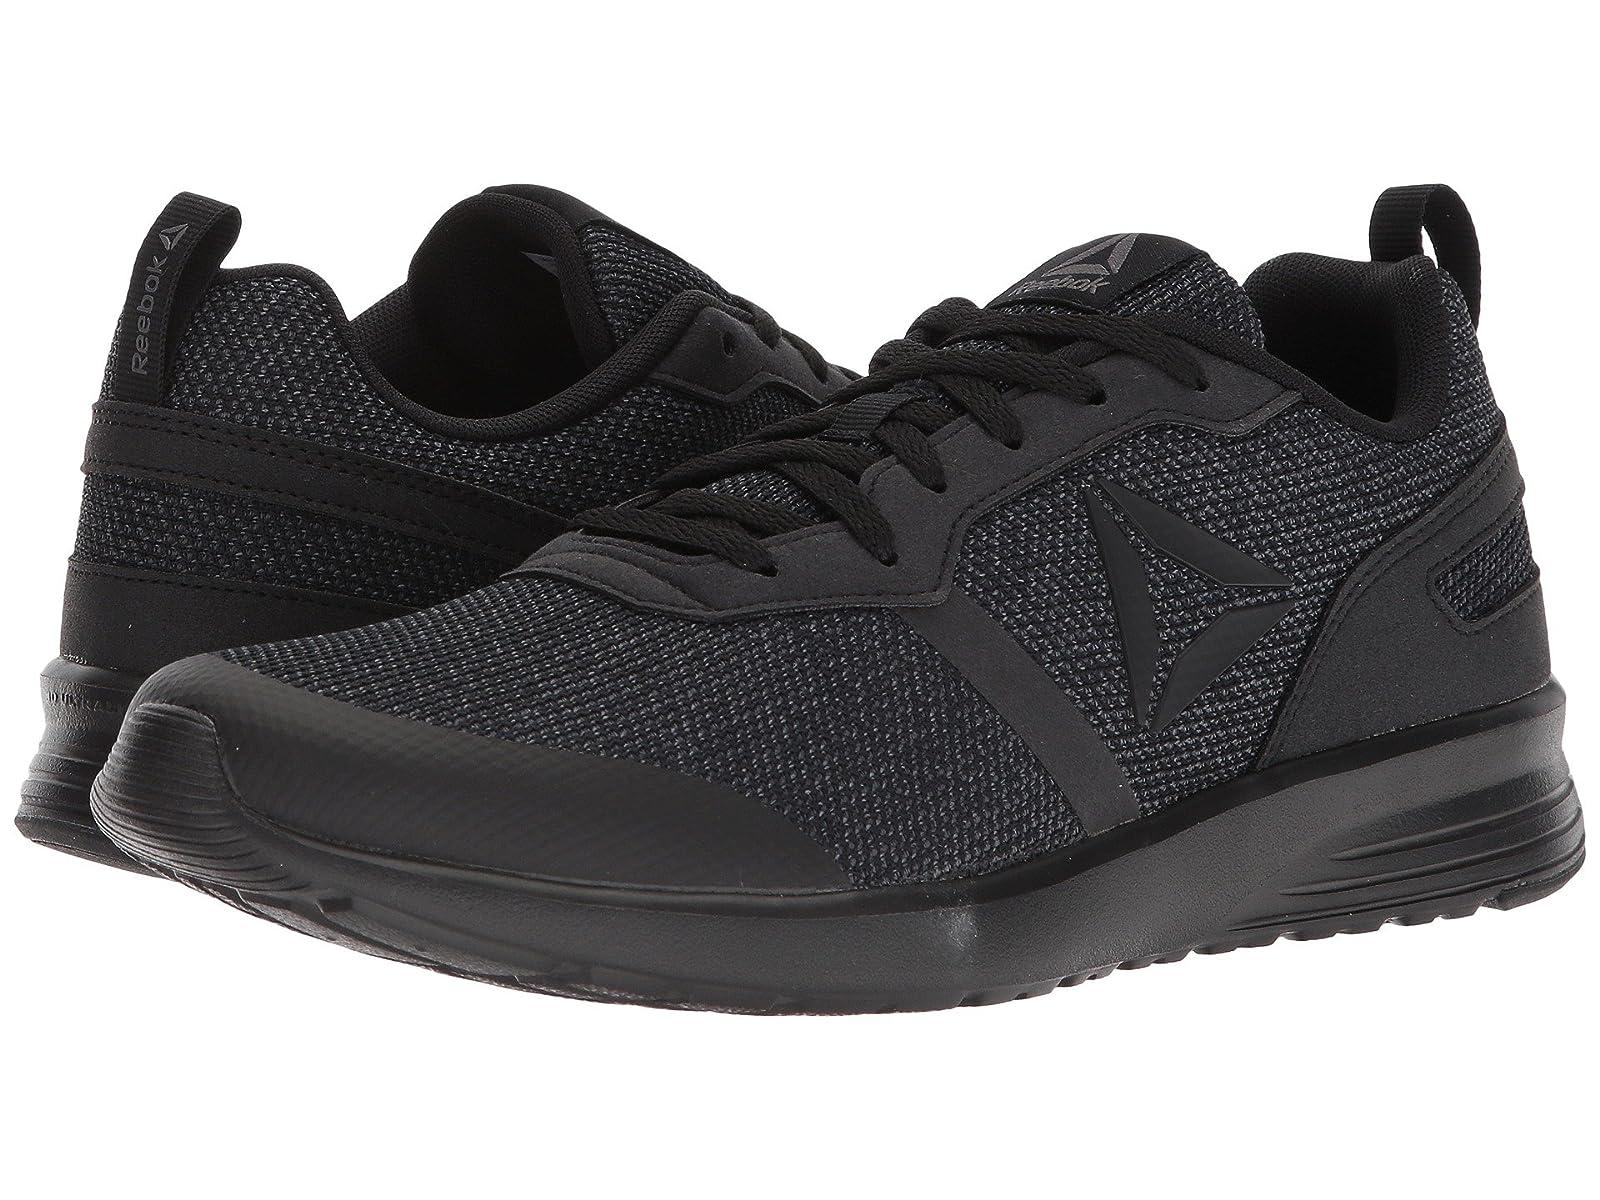 Reebok Foster FlyerCheap and distinctive eye-catching shoes